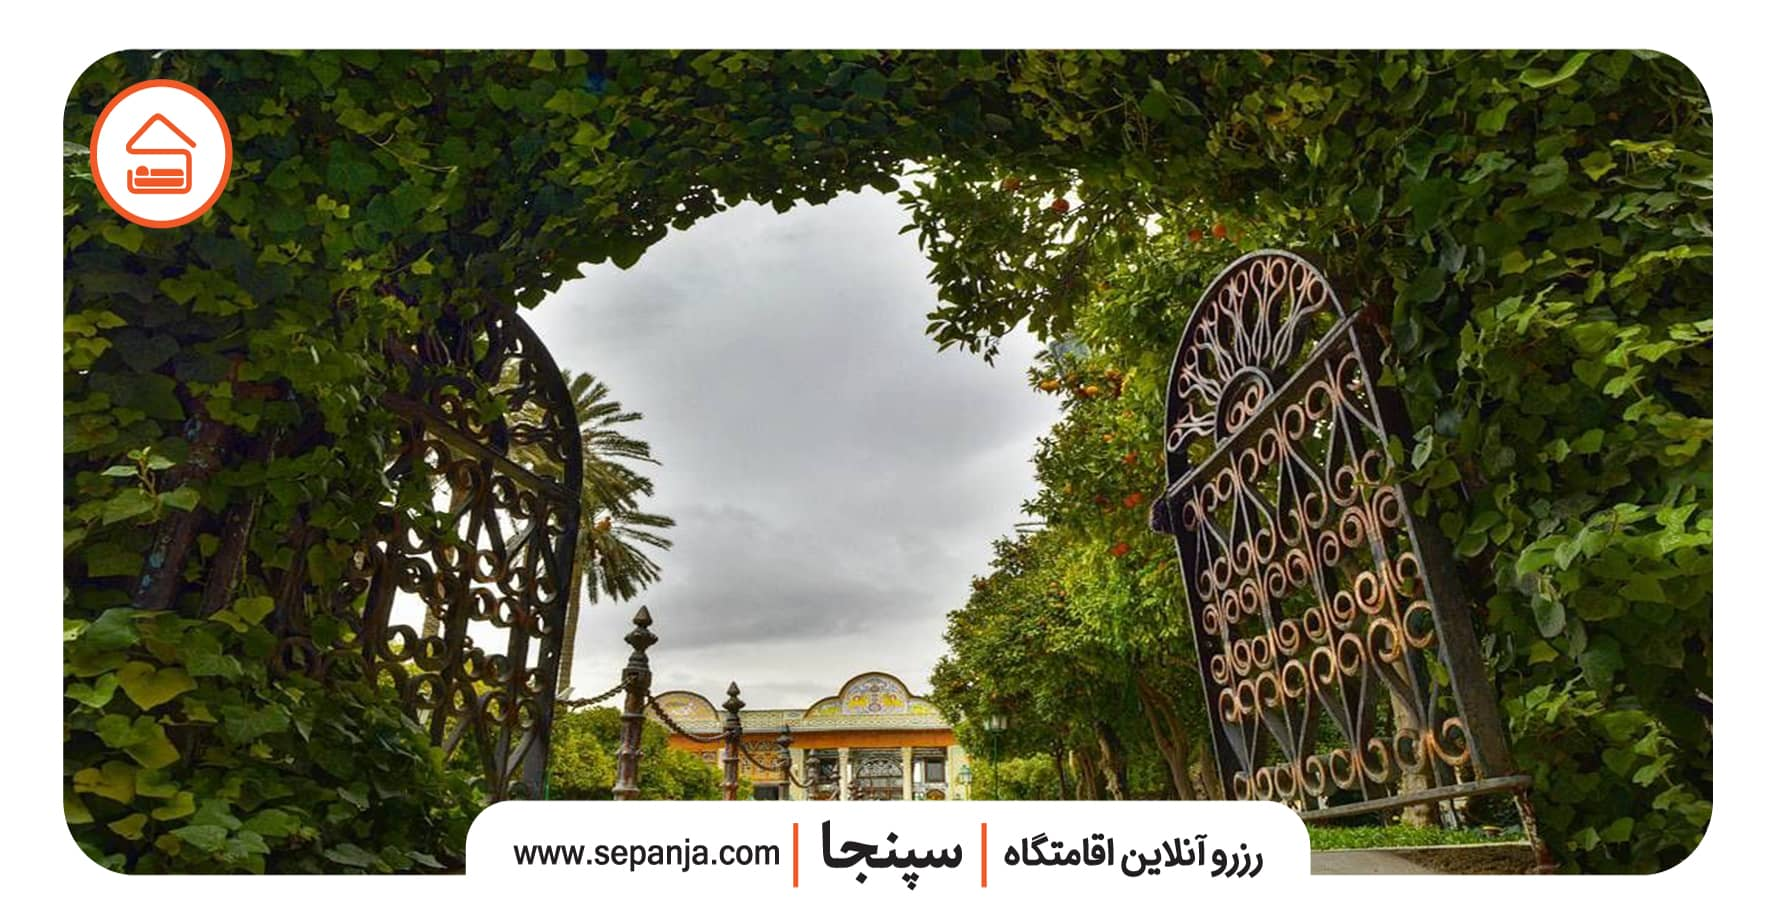 معماری نارنجستان قوام